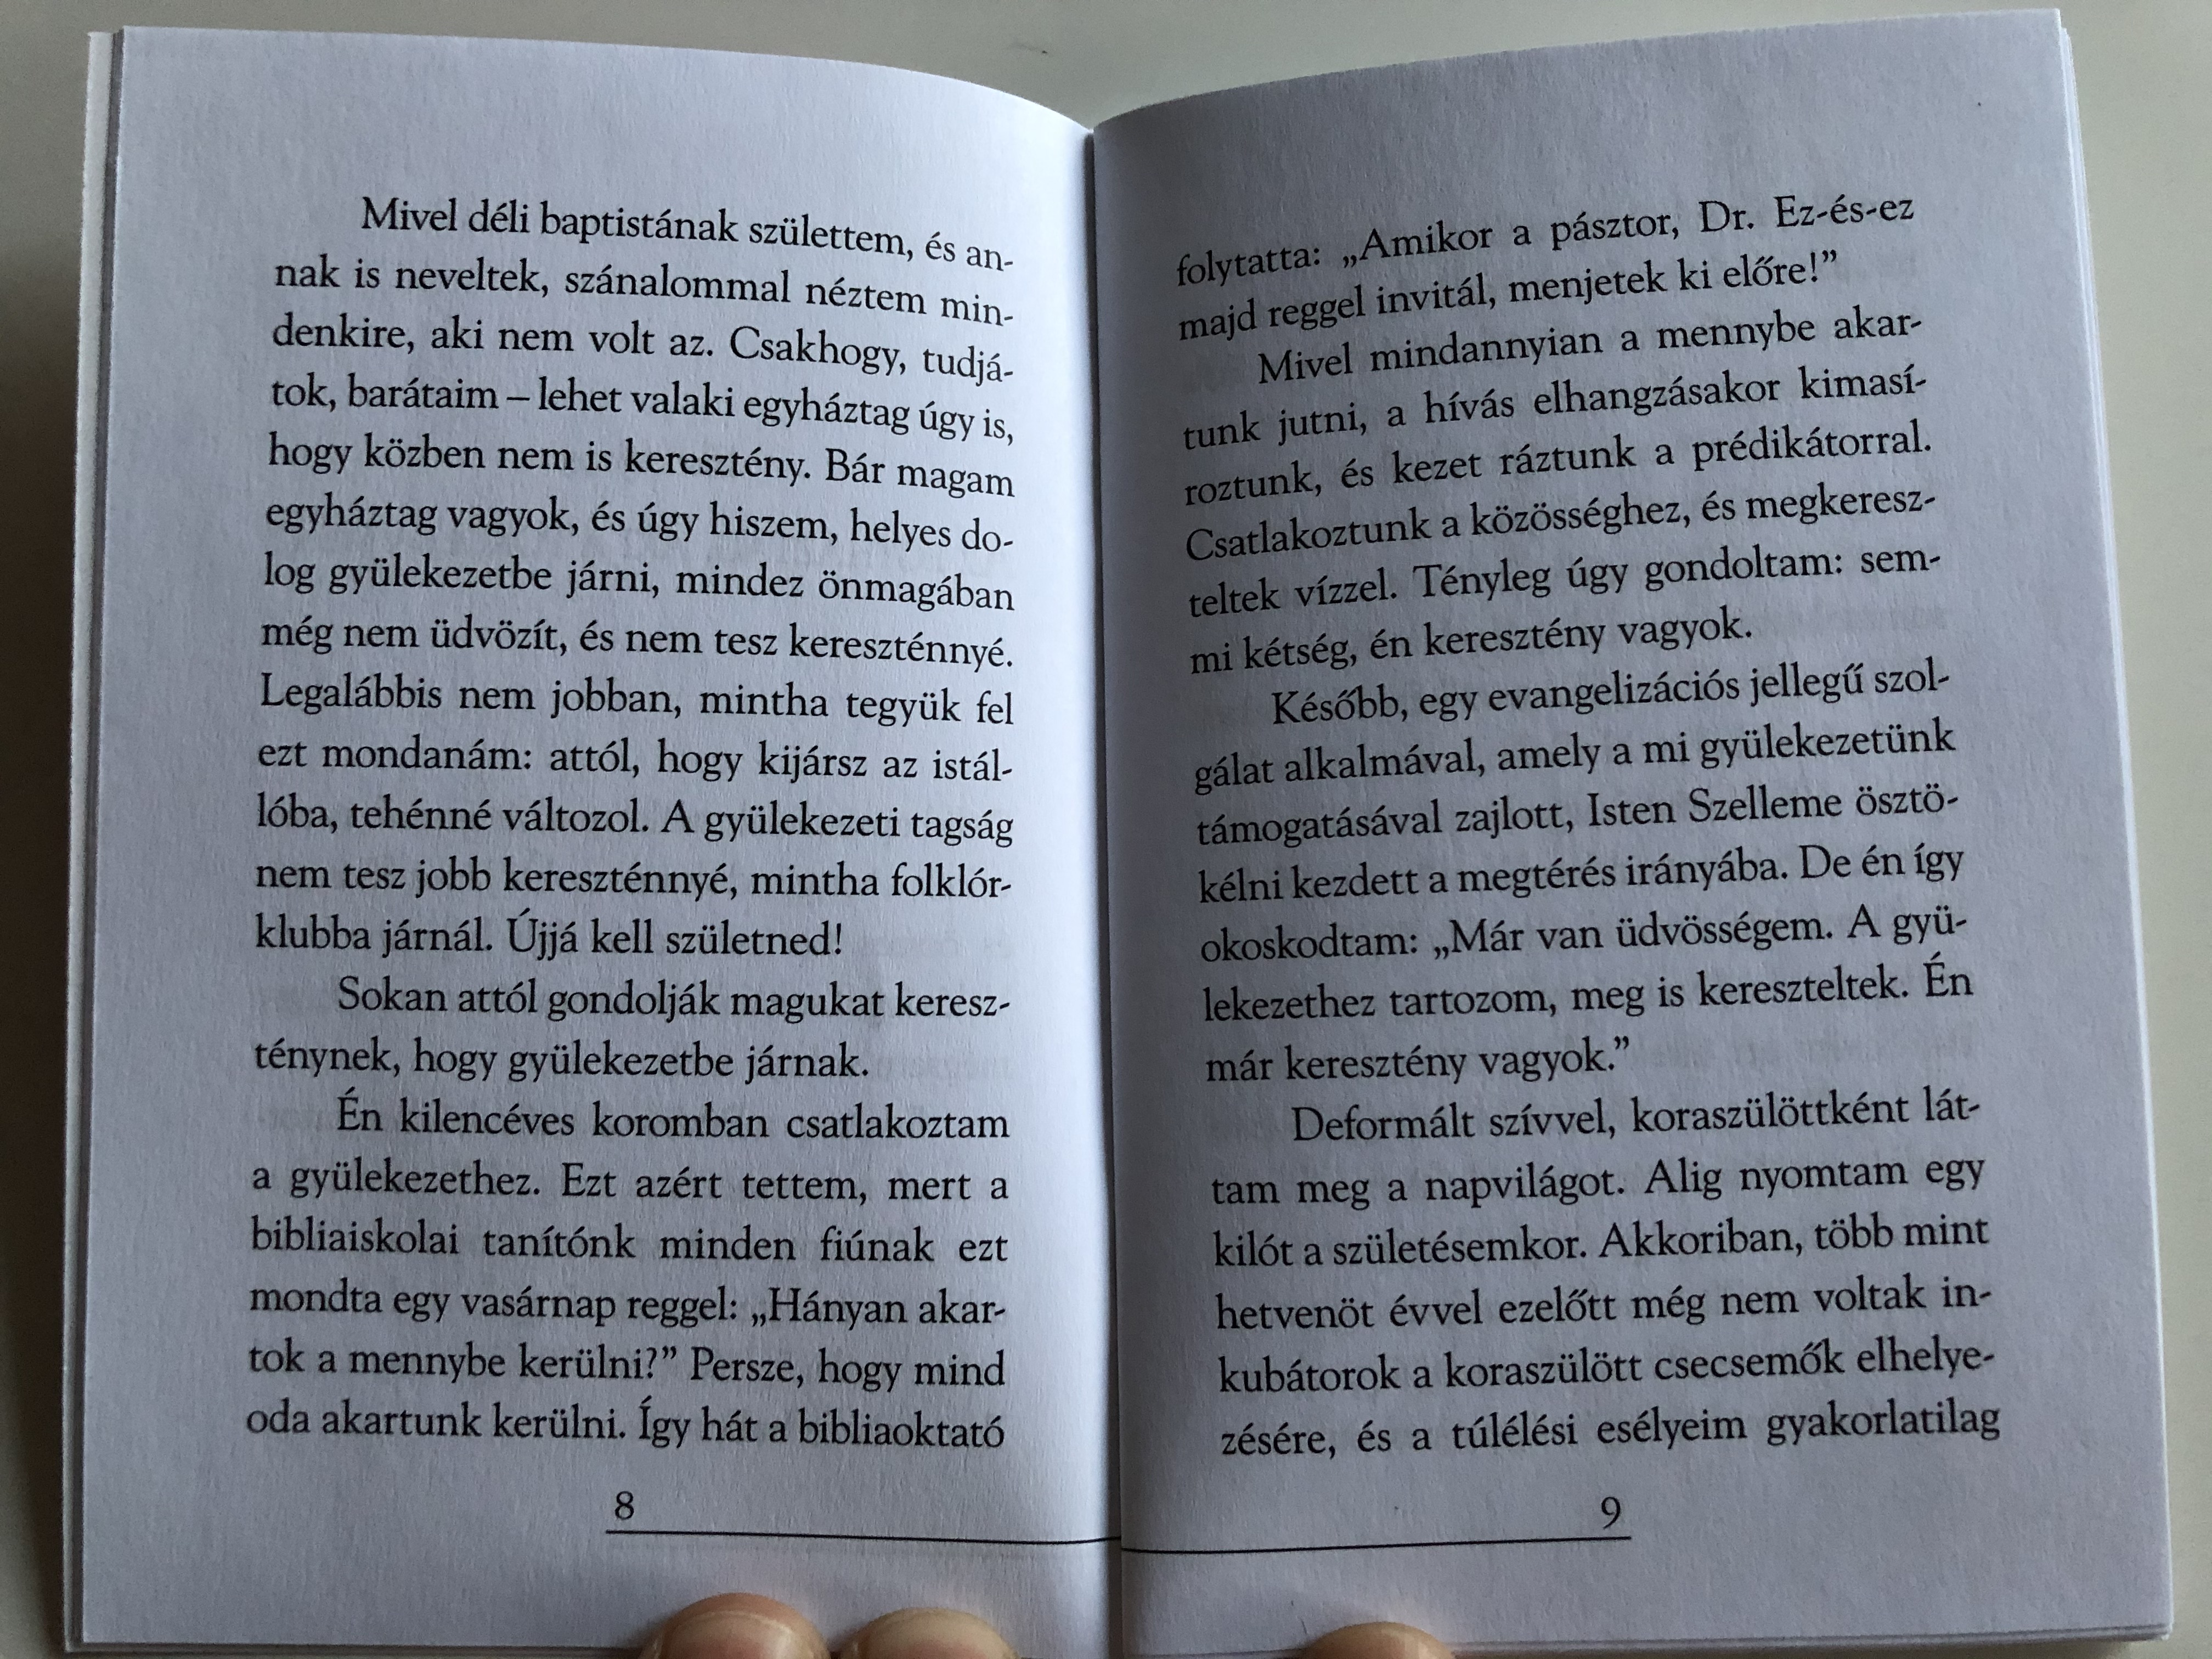 a-pokol-kapuj-ban-by-kenneth-e.-hagin-hungarian-edition-of-hell-5-.jpg